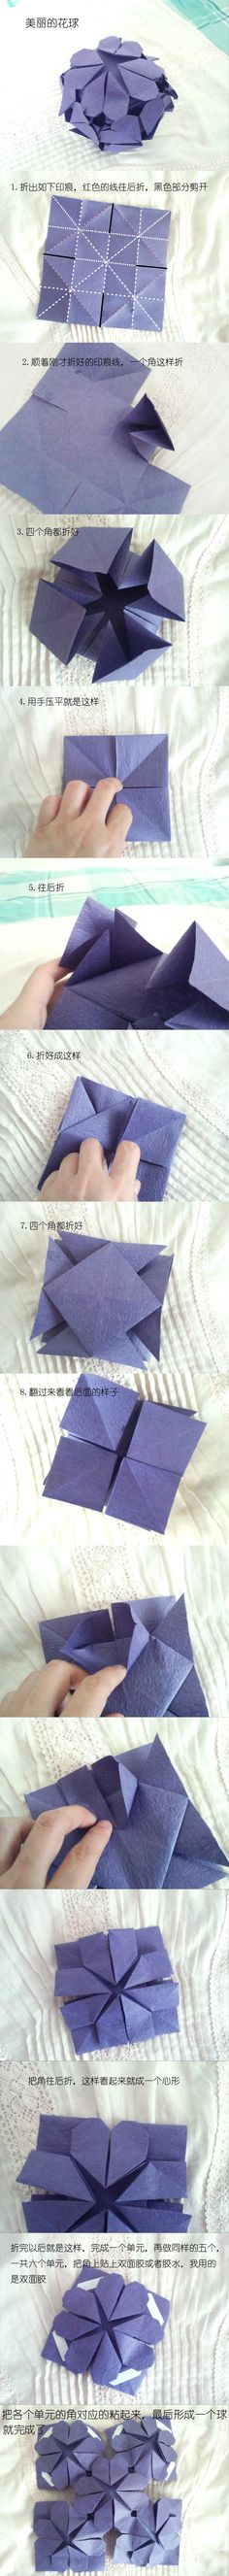 http://www.duitang.com/people/mblog/23201096/detail/